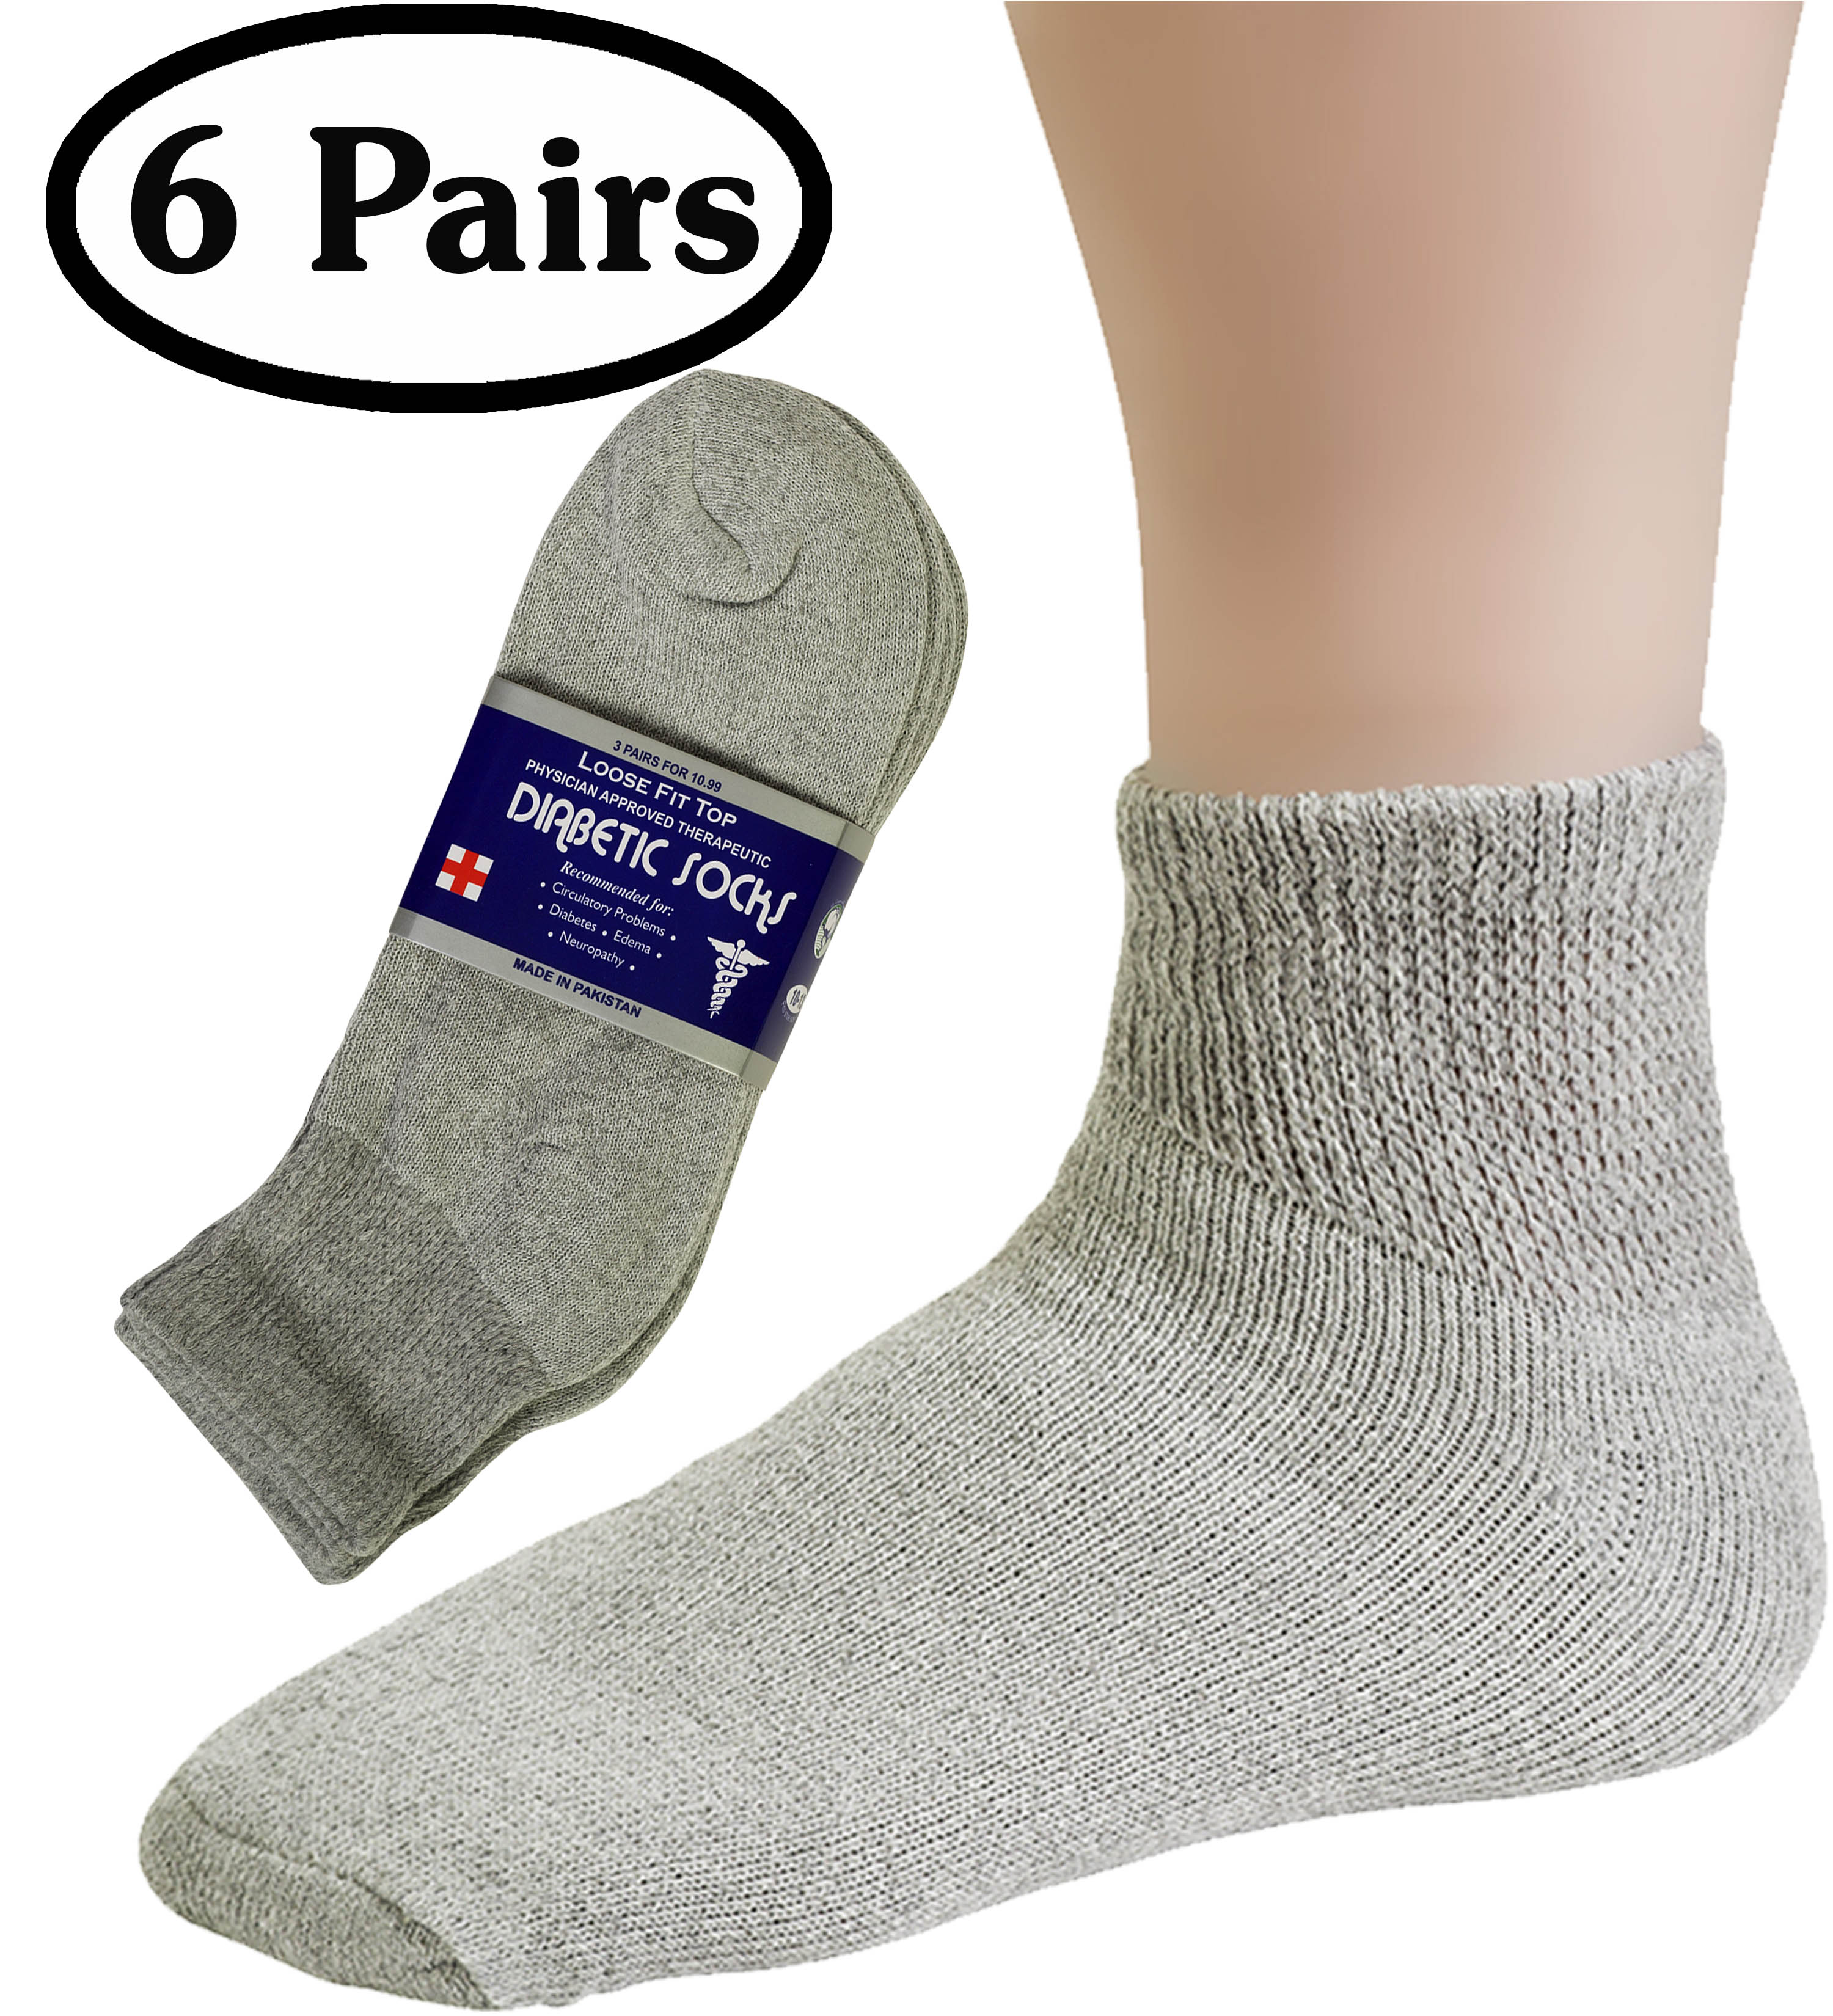 4 Pair Of Diabetic Non Binding Women Socks Size 9-11 Extra Soft Black